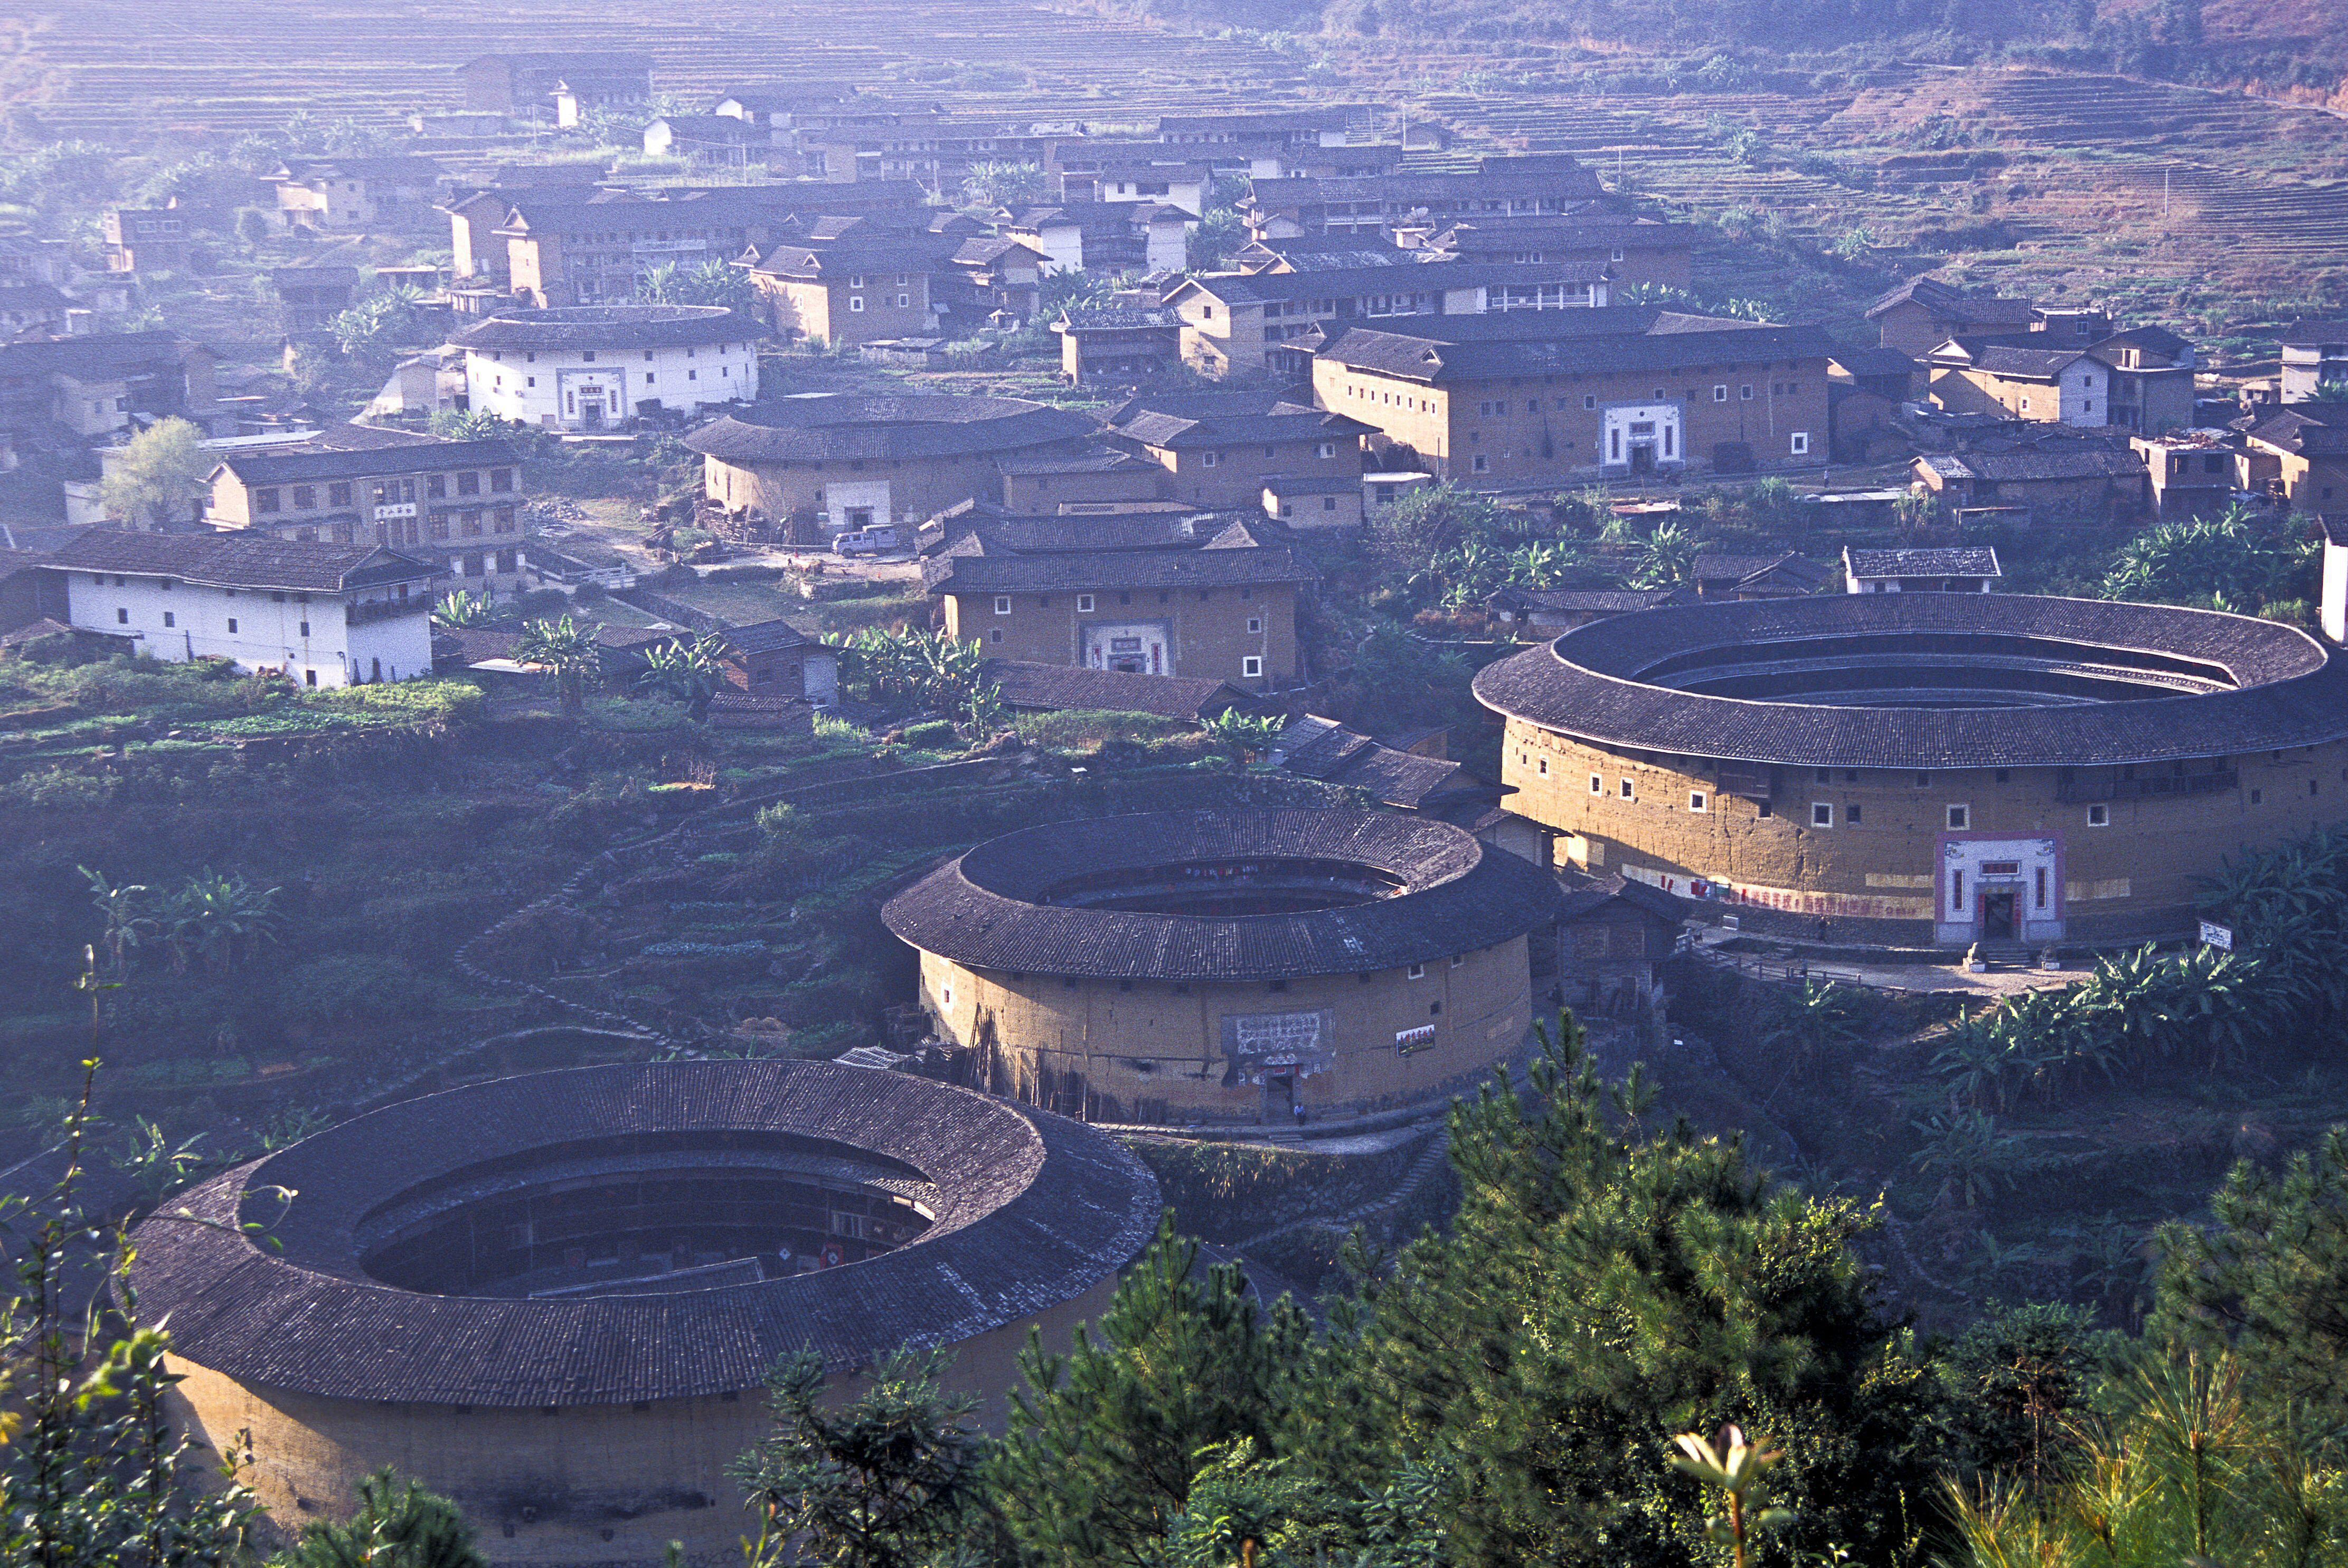 Hakka Earth Dwellings in Chuxi village, Fujian Province, China